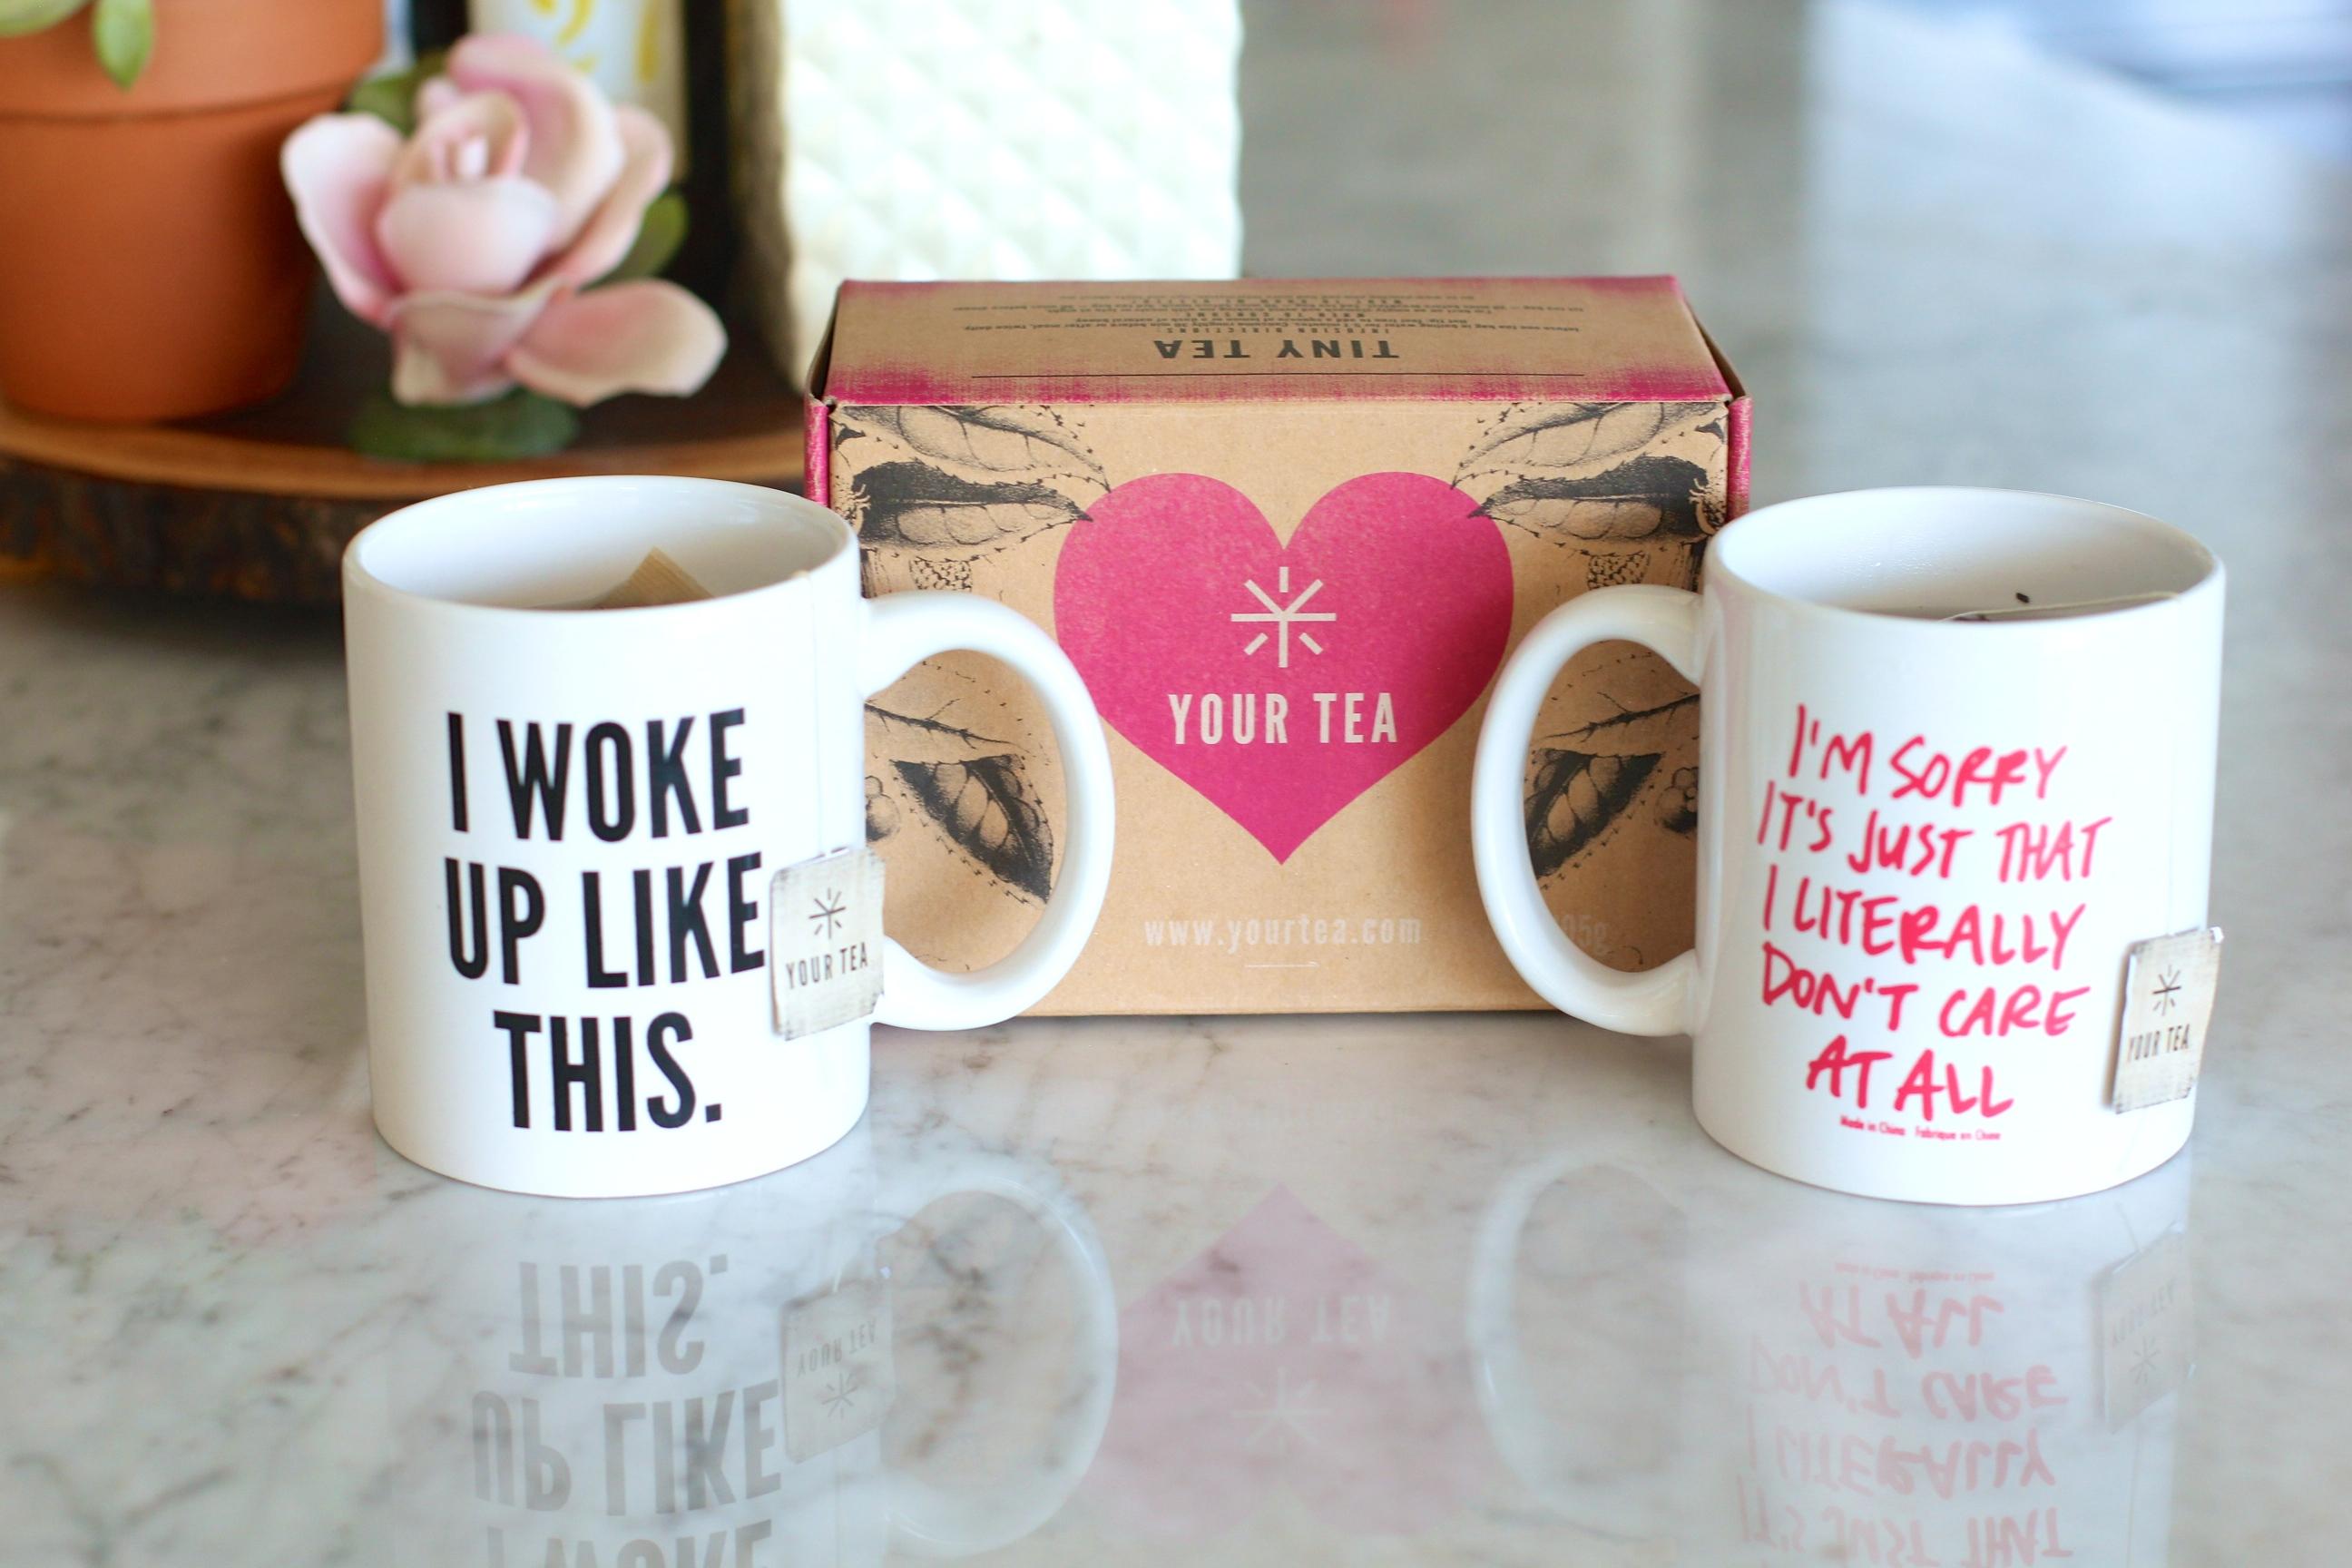 missyonmadison, melissa tierney, fashion blogger, tiny tea tox, your tea, kohls, target skinny jeans, skinny jeans, distressed skinny jeans, ray bans, urban outfitters, tea, mug, quote mugs, i woke up like this mug, vera bradley napkins, brunette hair,